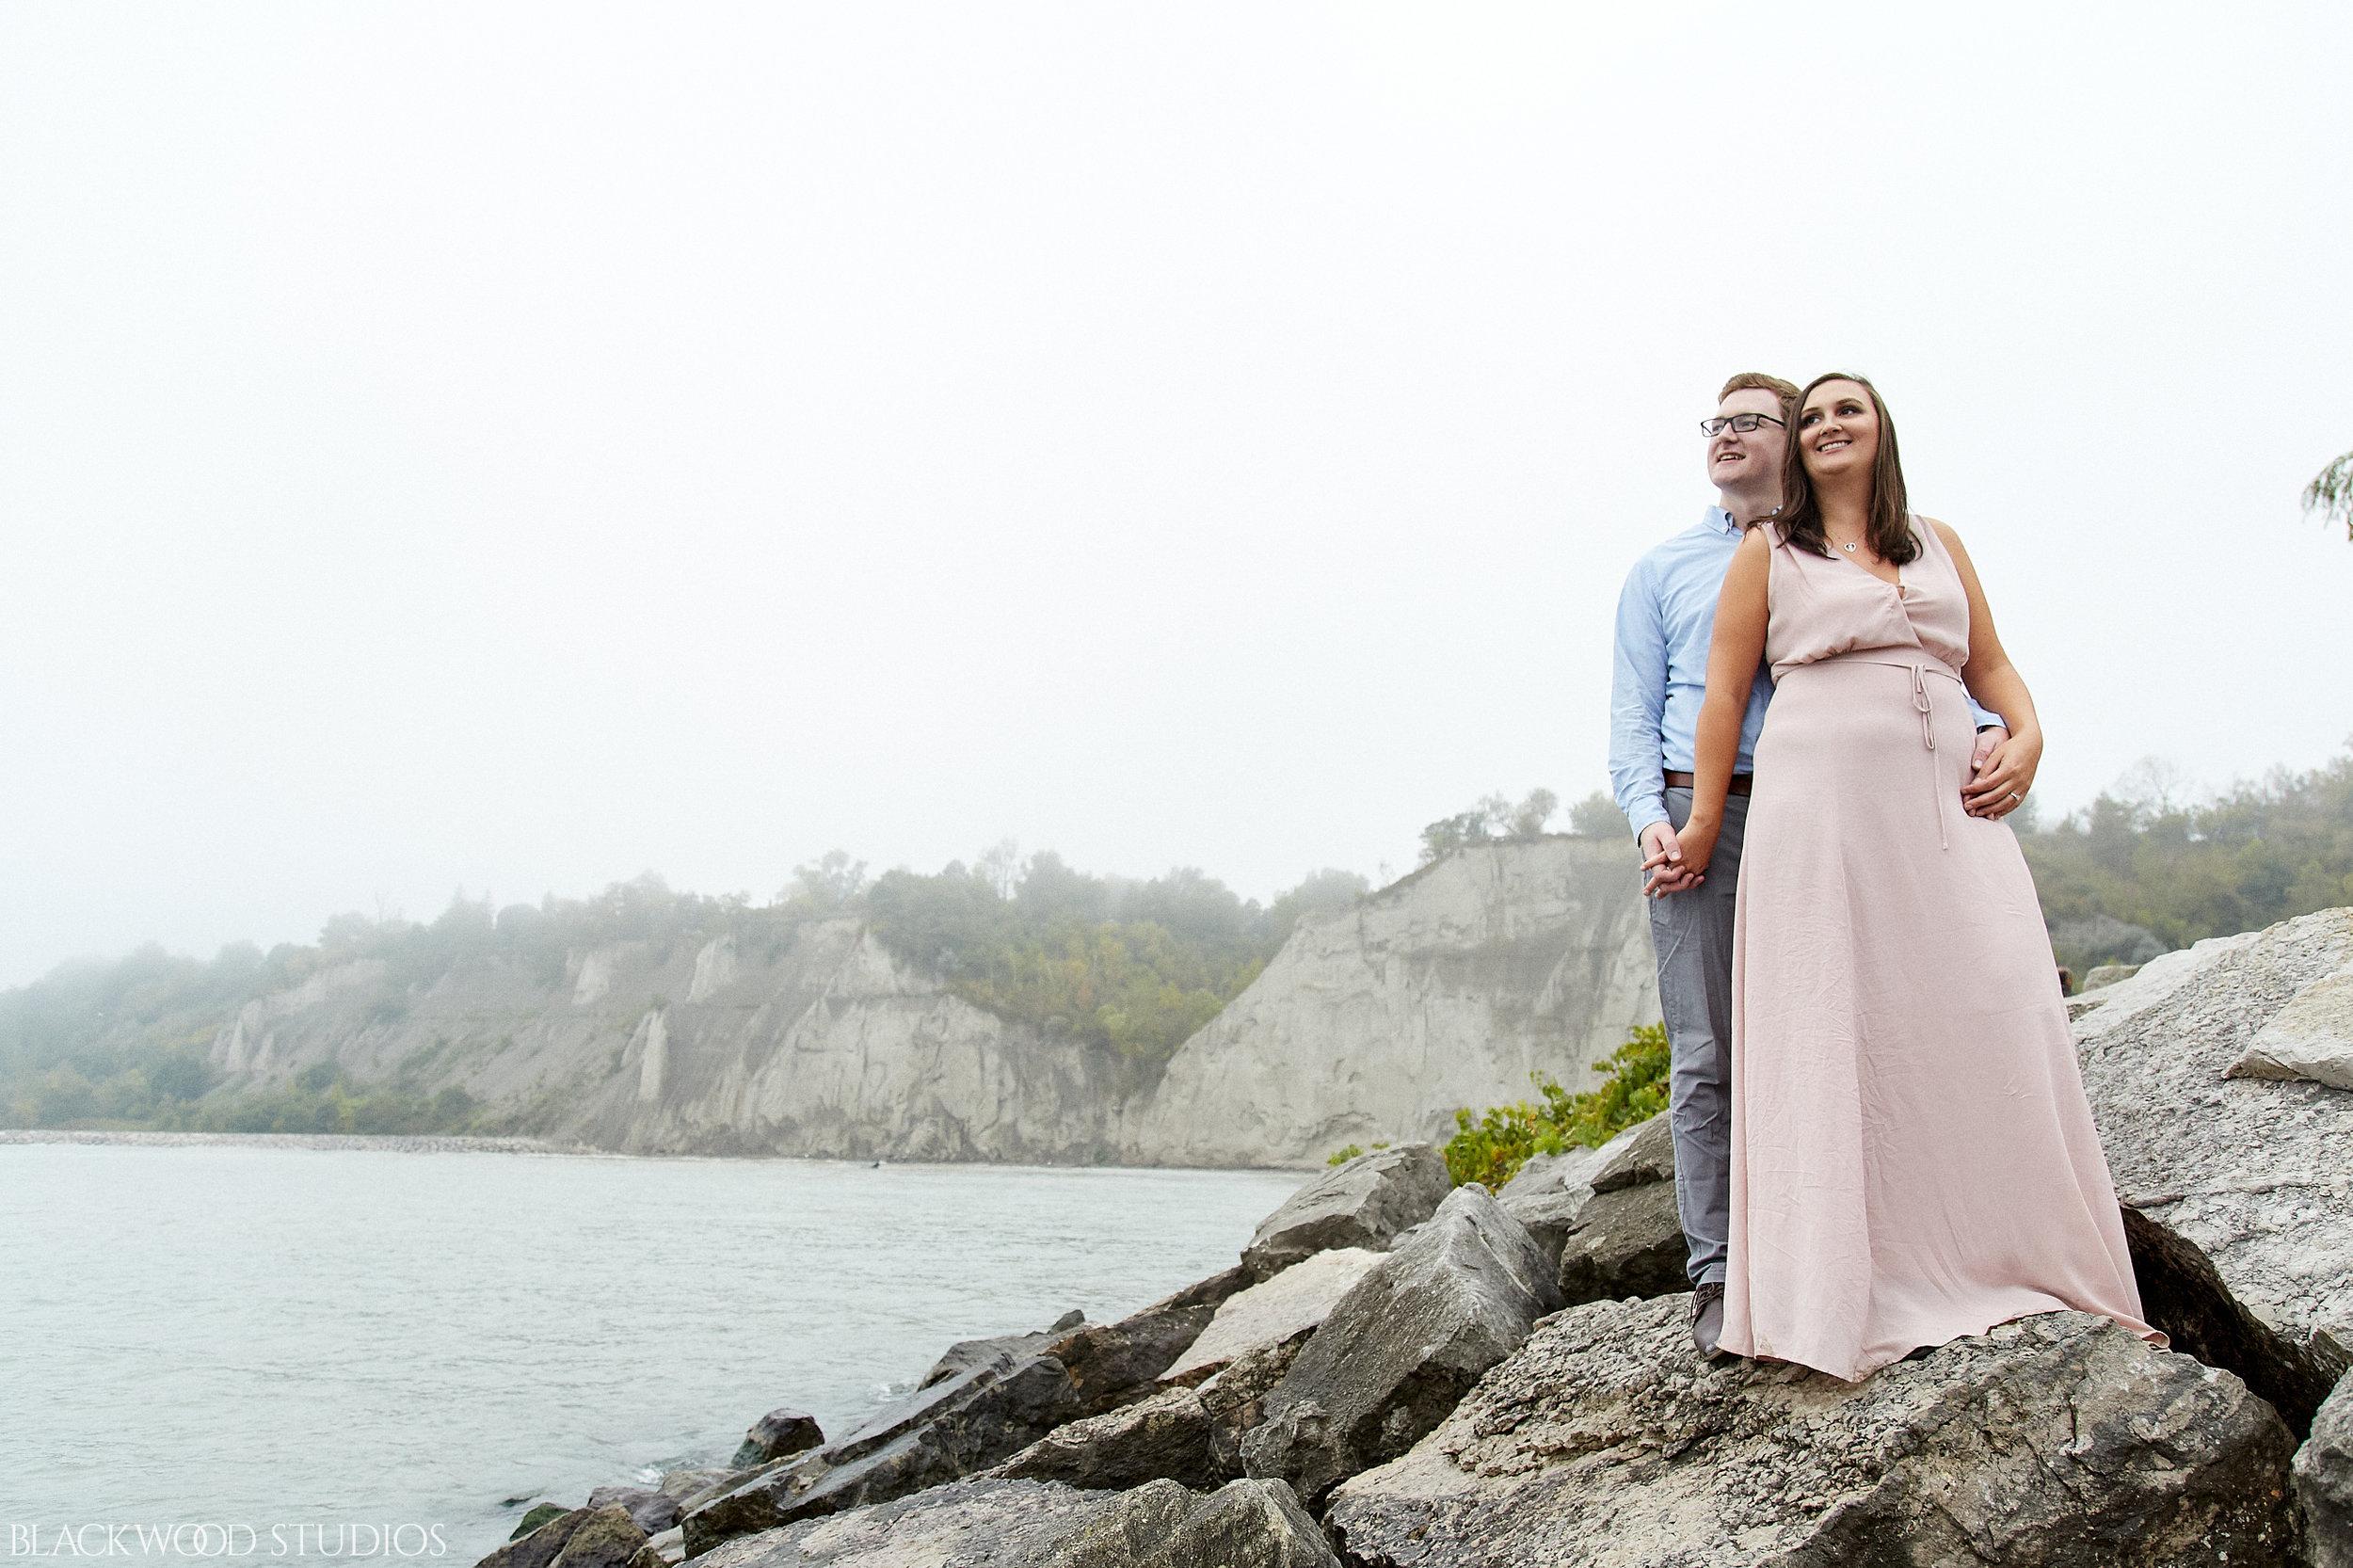 Blackwood-Studios-20181008-18-00-18-Justin-and-Samantha-Engagement-Photography-foggy-Scaraborough-Bluffs-Park-Ontario.jpg